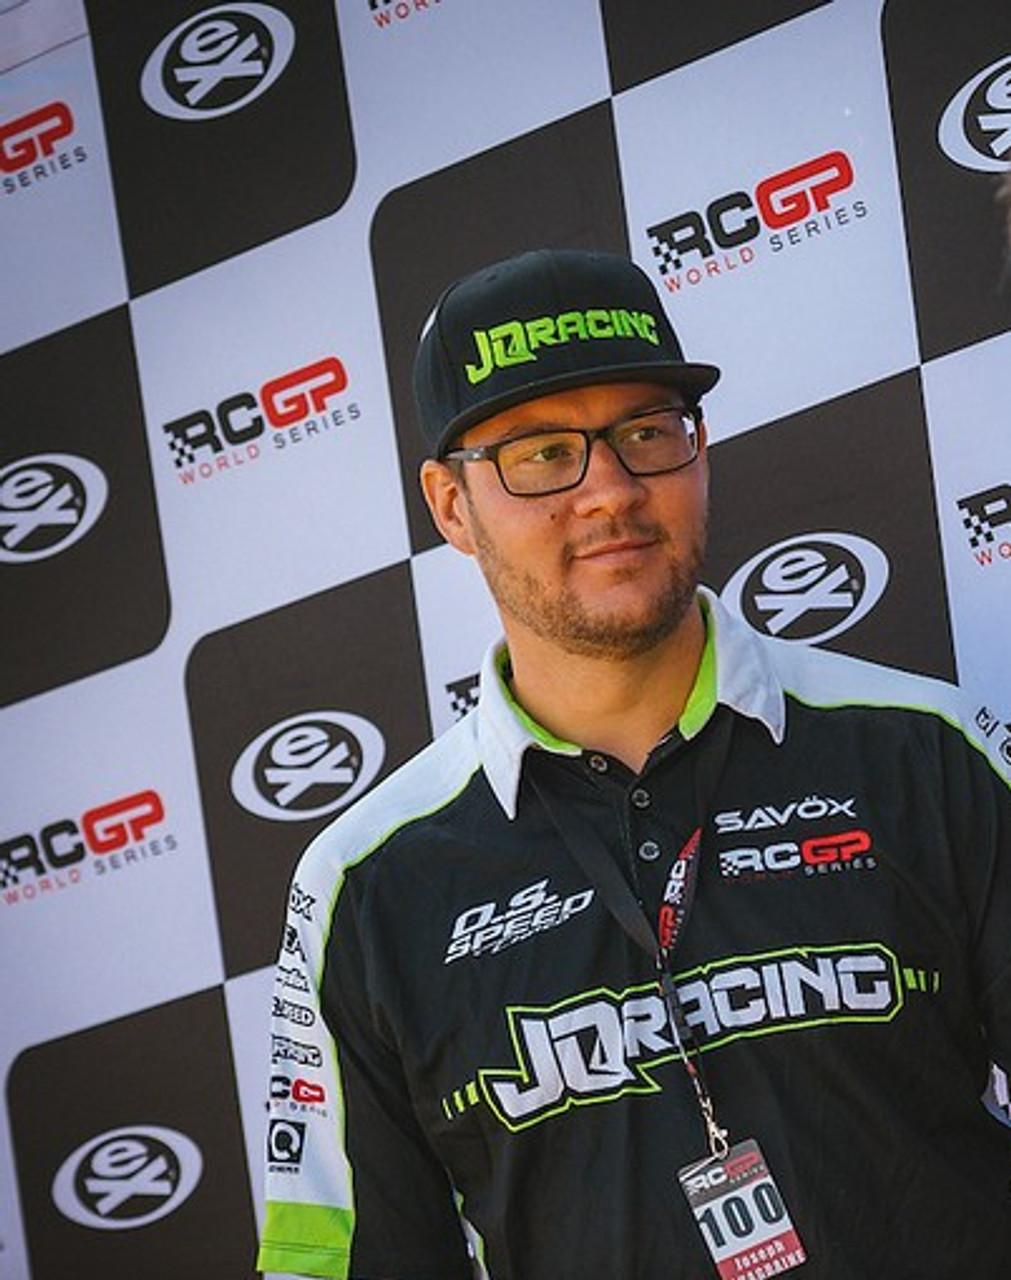 JQ Racing 2019 RCGP Collard Dye-Sub Team Shirt (Large)